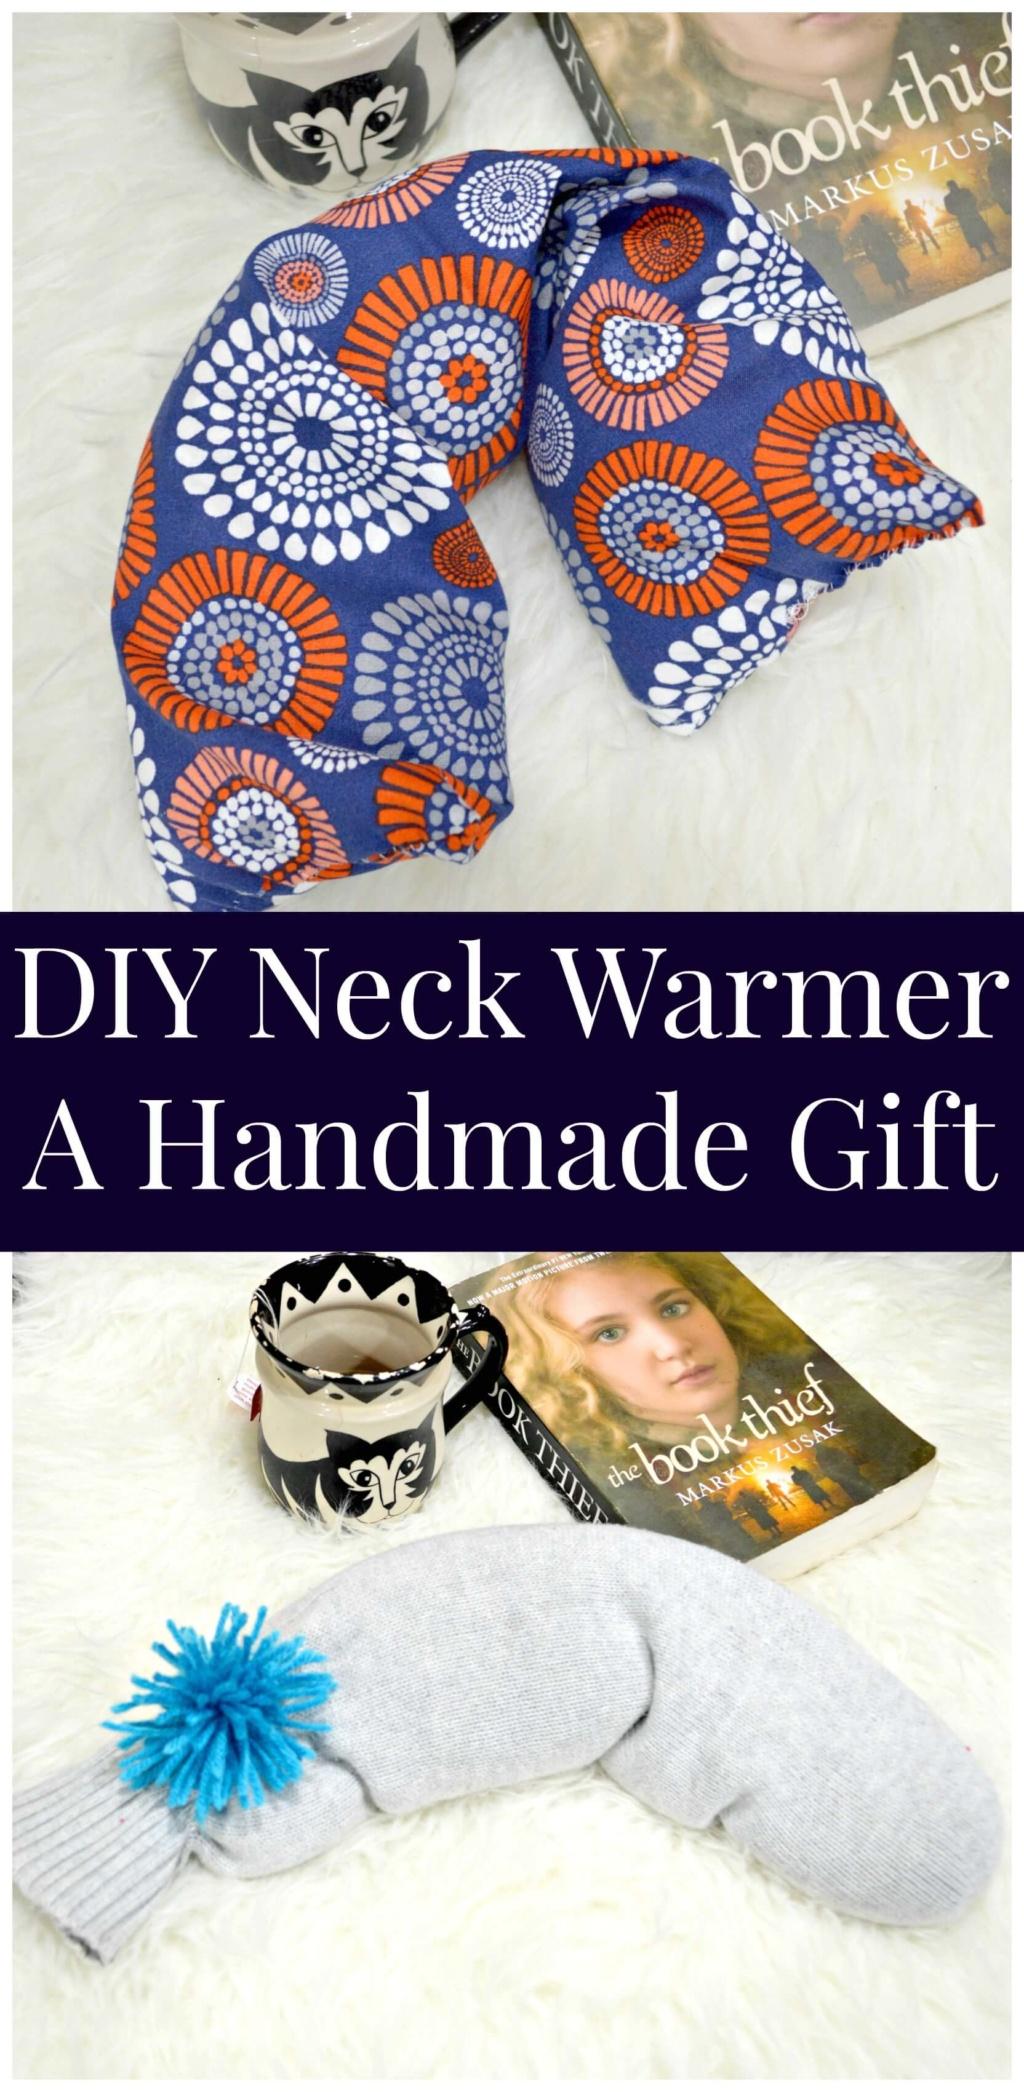 DIY Neck Warmer – A Handmade Gift